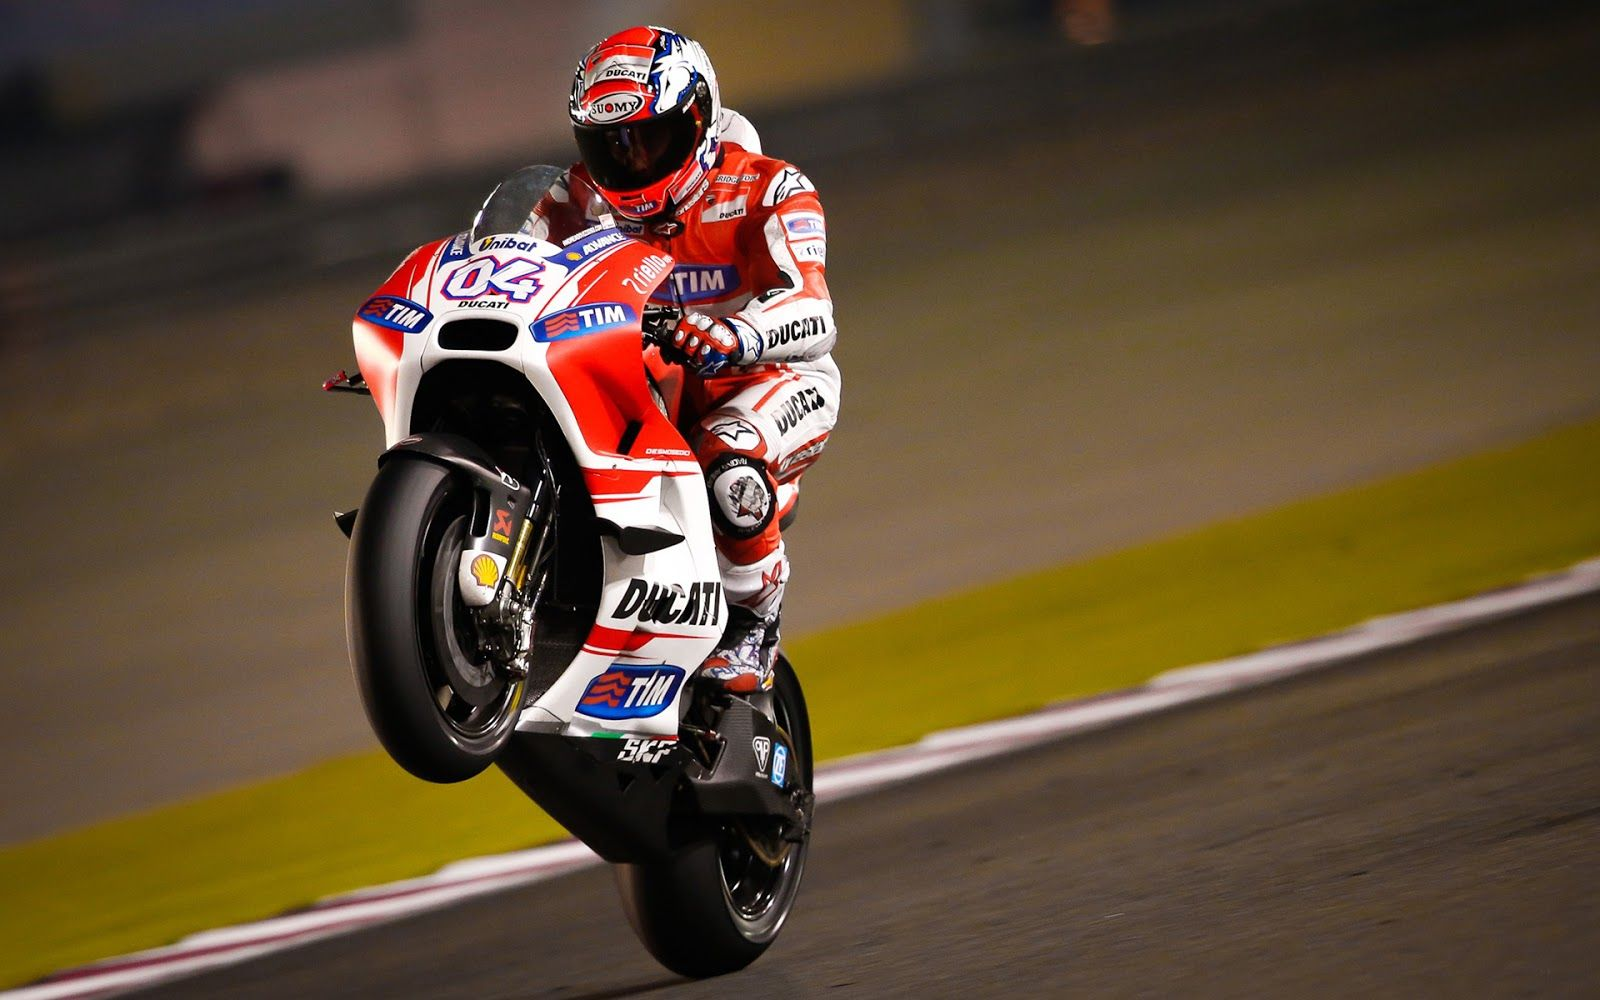 Motogp Wallpaper Hd Awesome With Images Ducati Motogp Racing